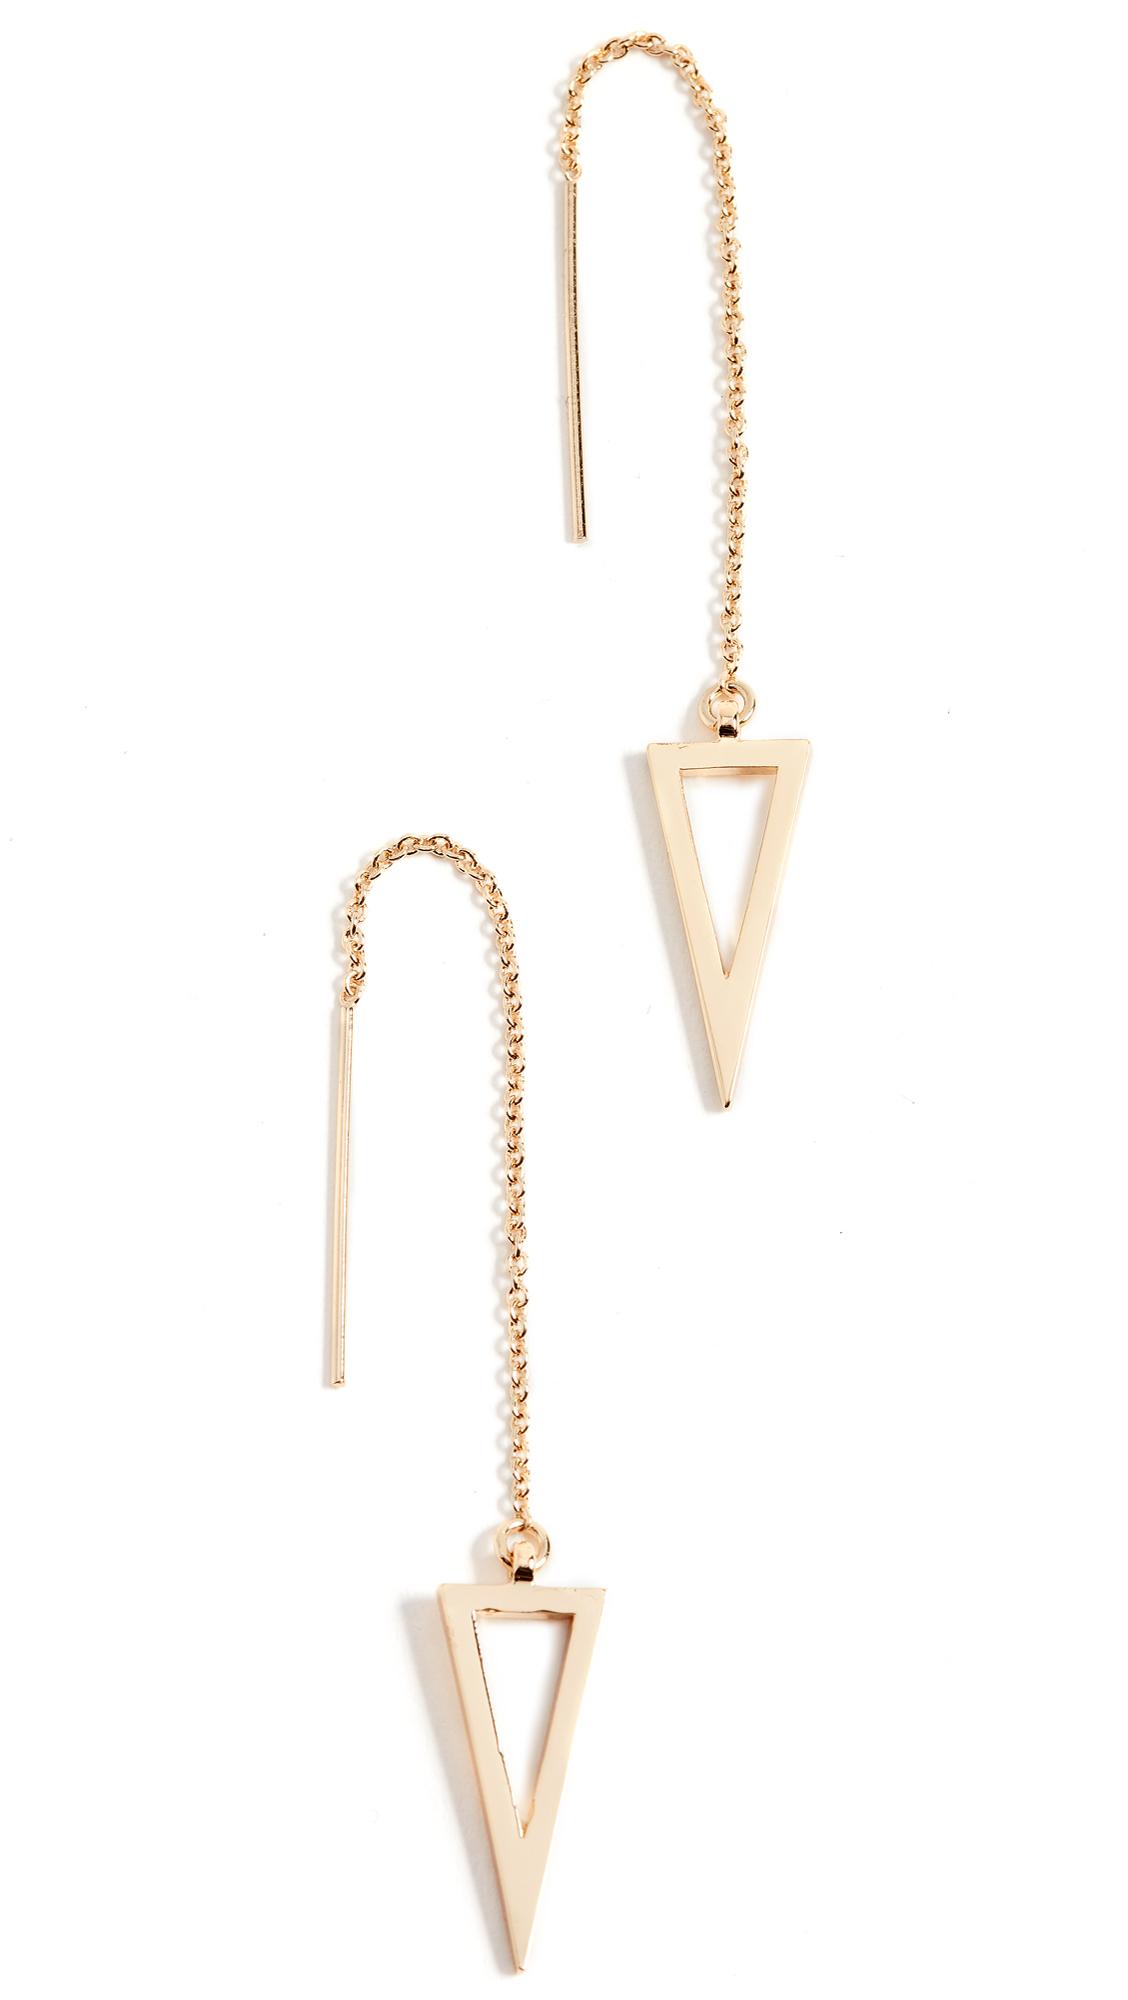 Rebecca Minkoff Long Triangle Frame Threader Earrings - Gold